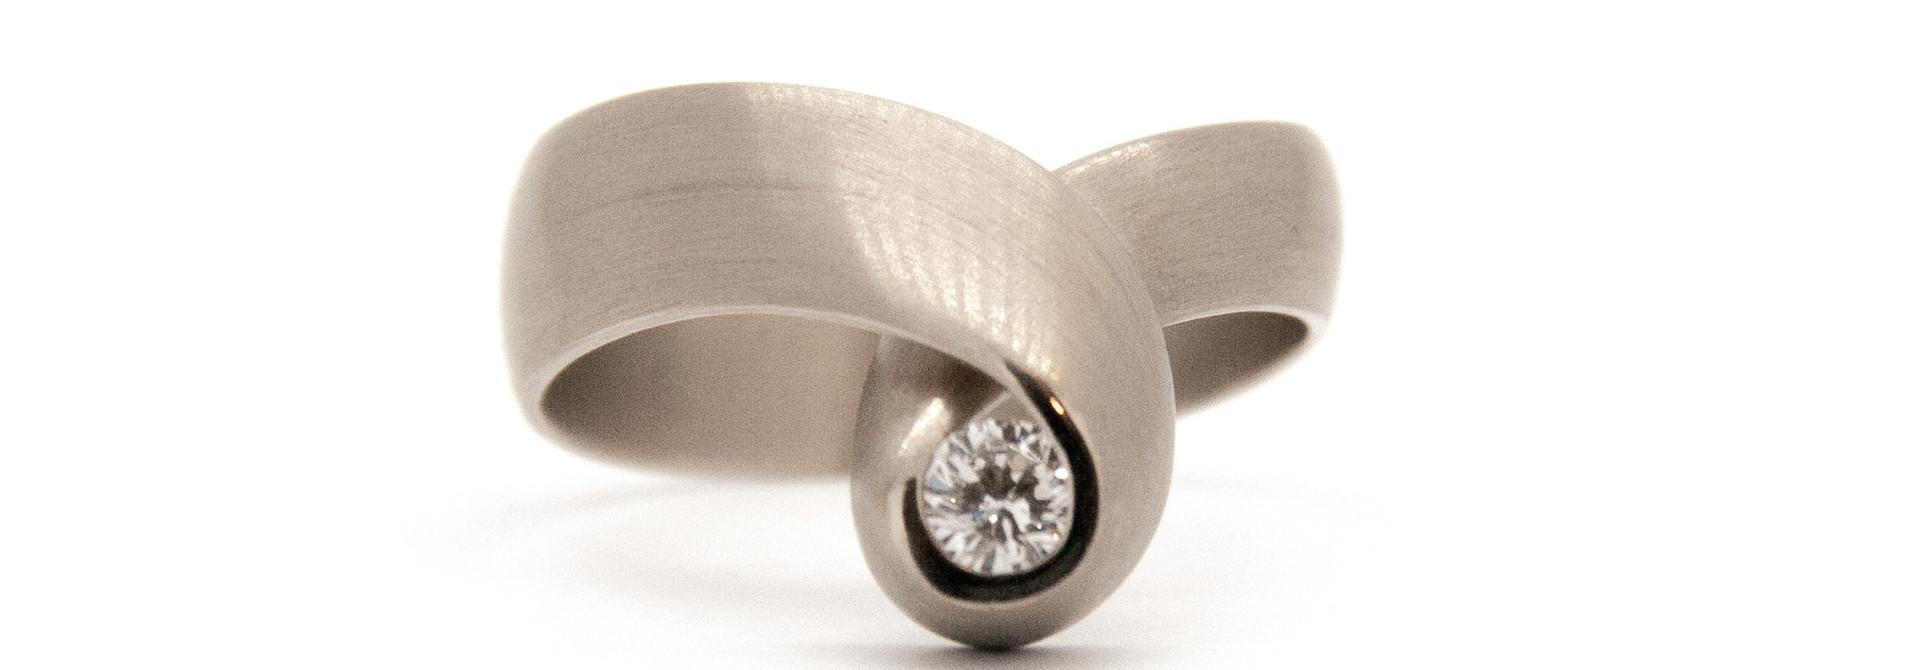 14k white gold ring size 56